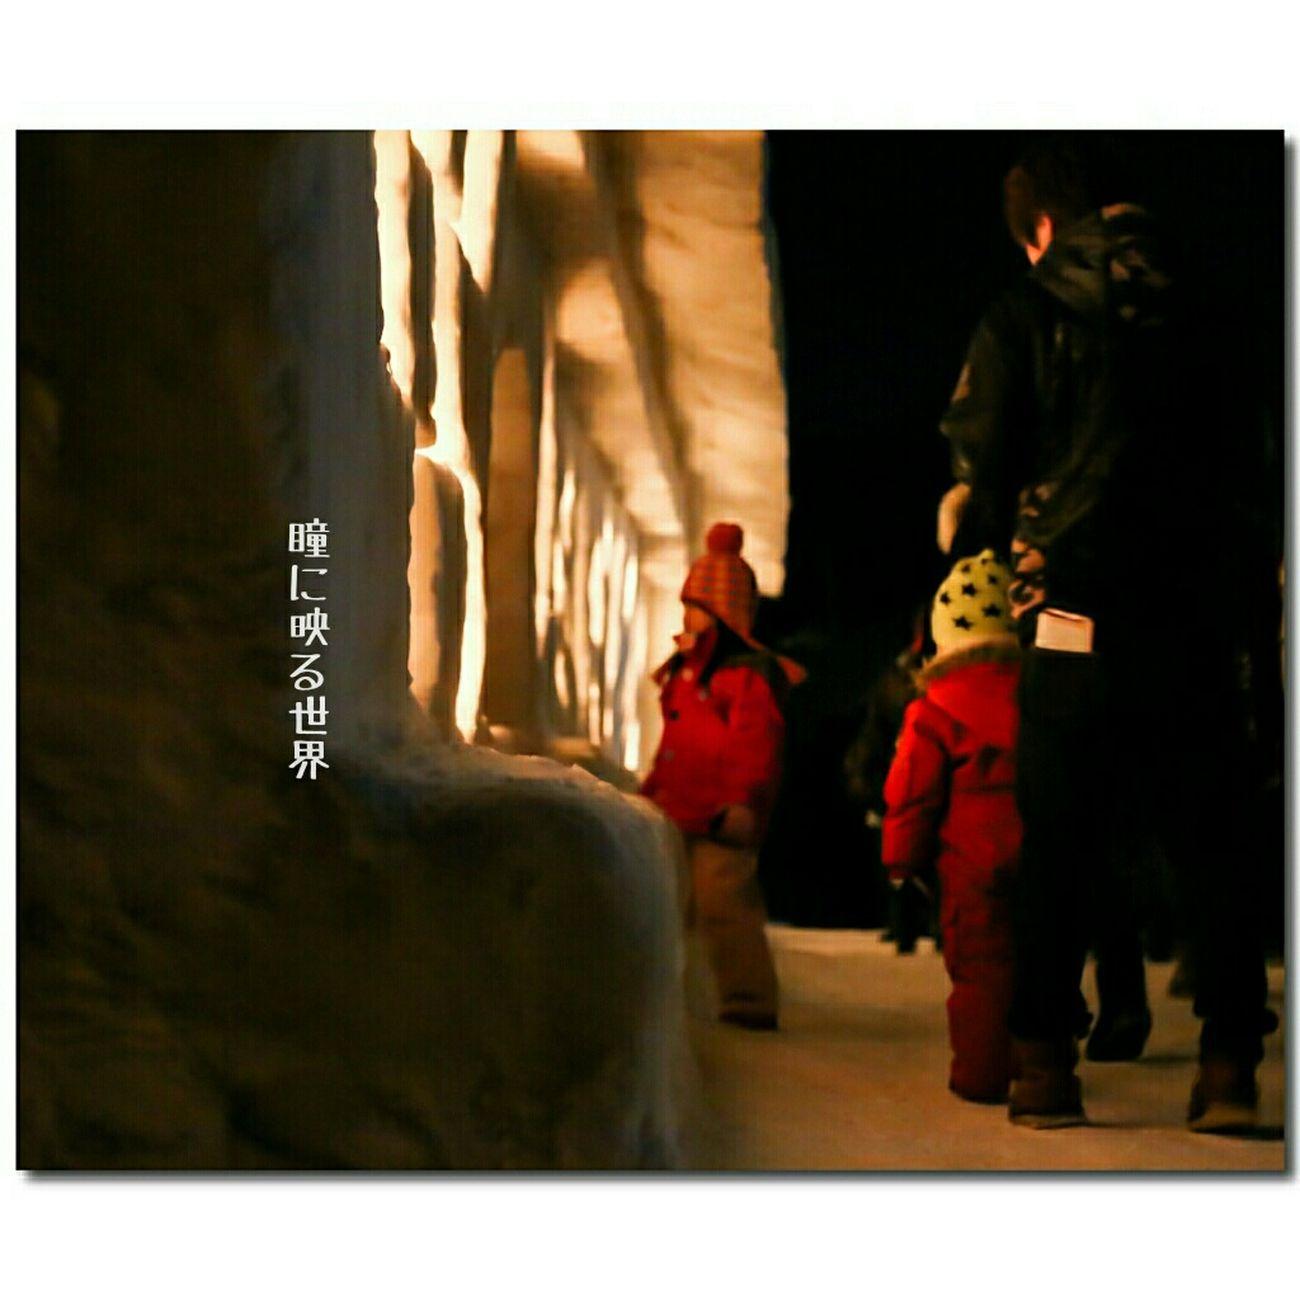 Nightphotography Snowfestival Light And Shadow People Watching YAMAGATA Japan 月山志津温泉雪旅籠の灯り